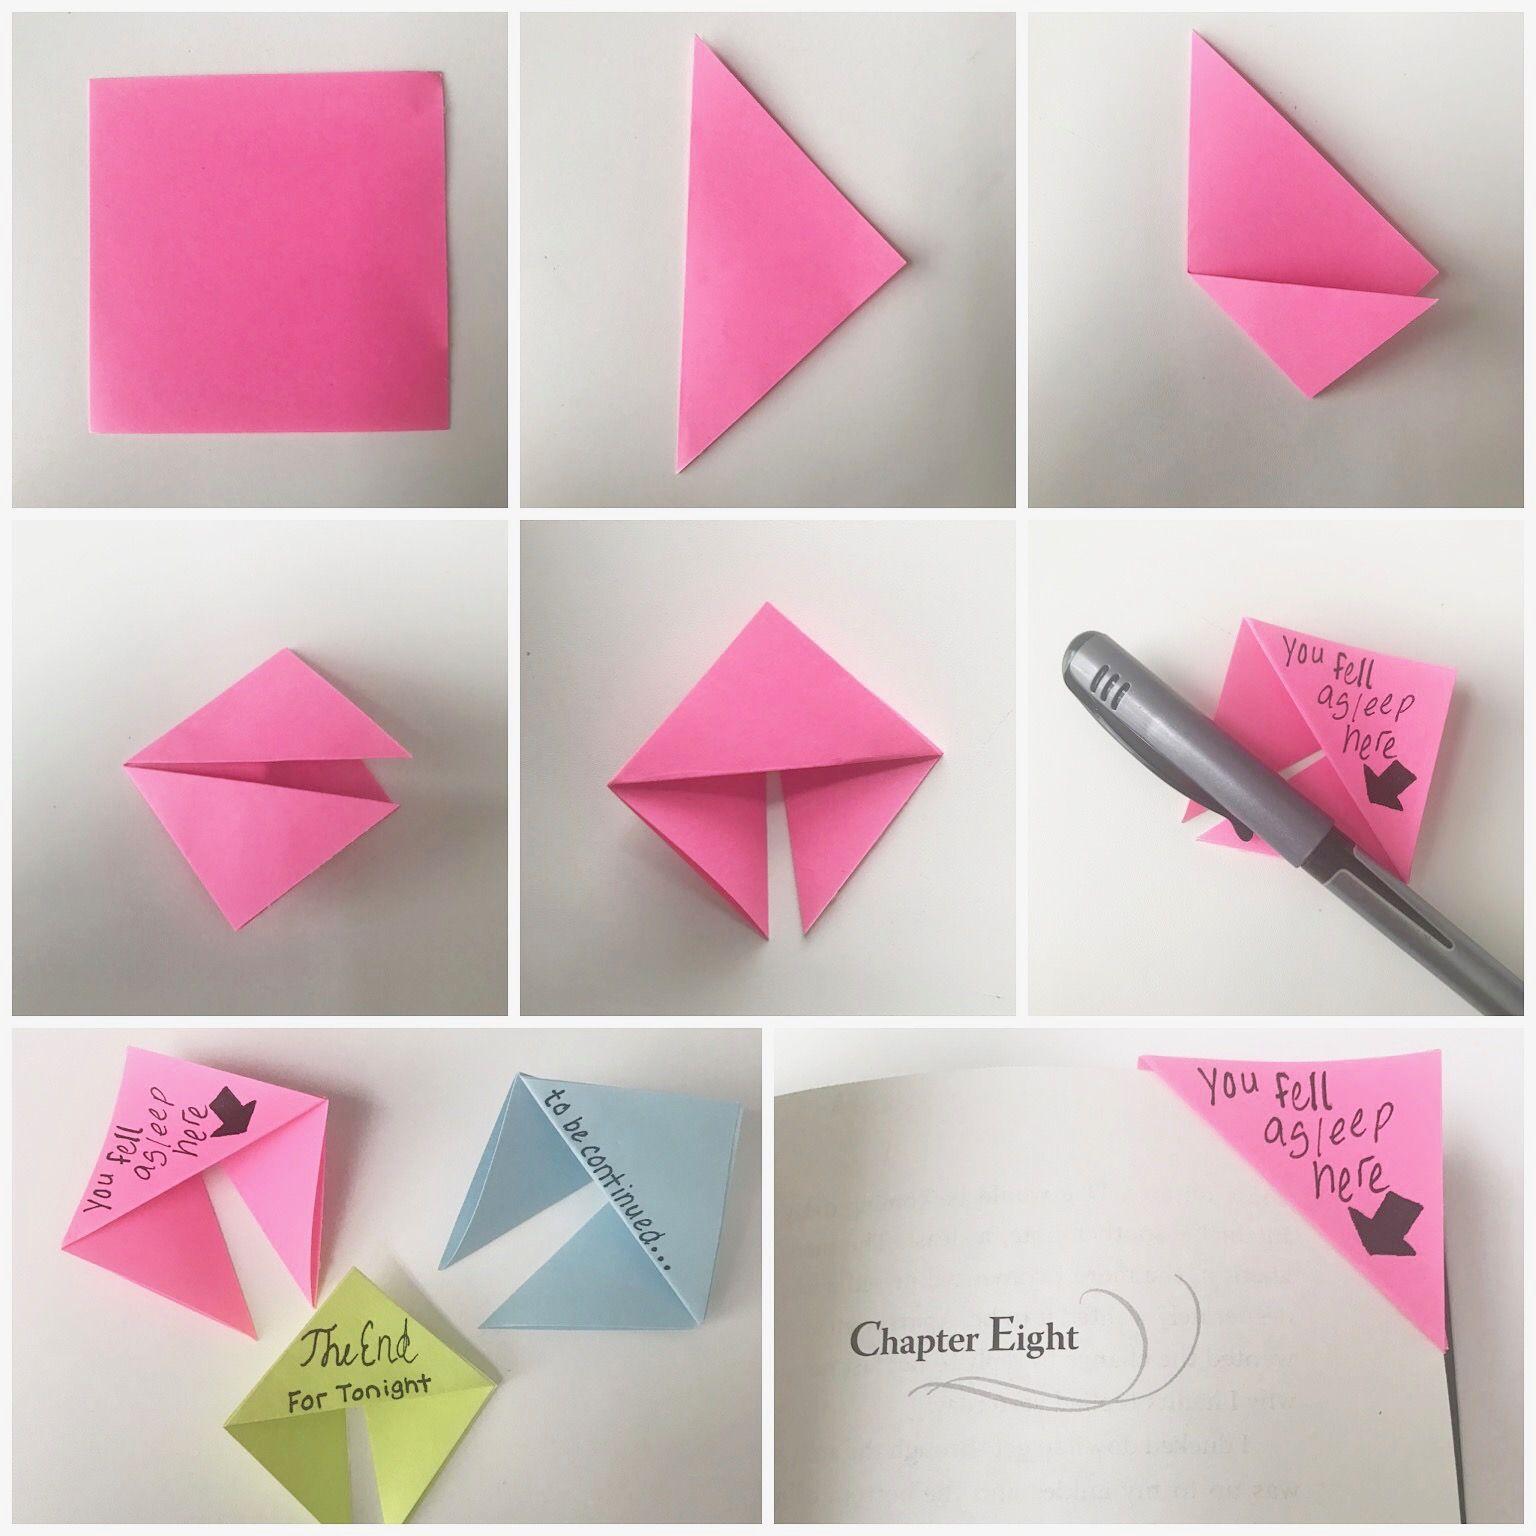 Diy Corner Bookmarks Book Origami Sticky Note Crafts Diy Bookmarks